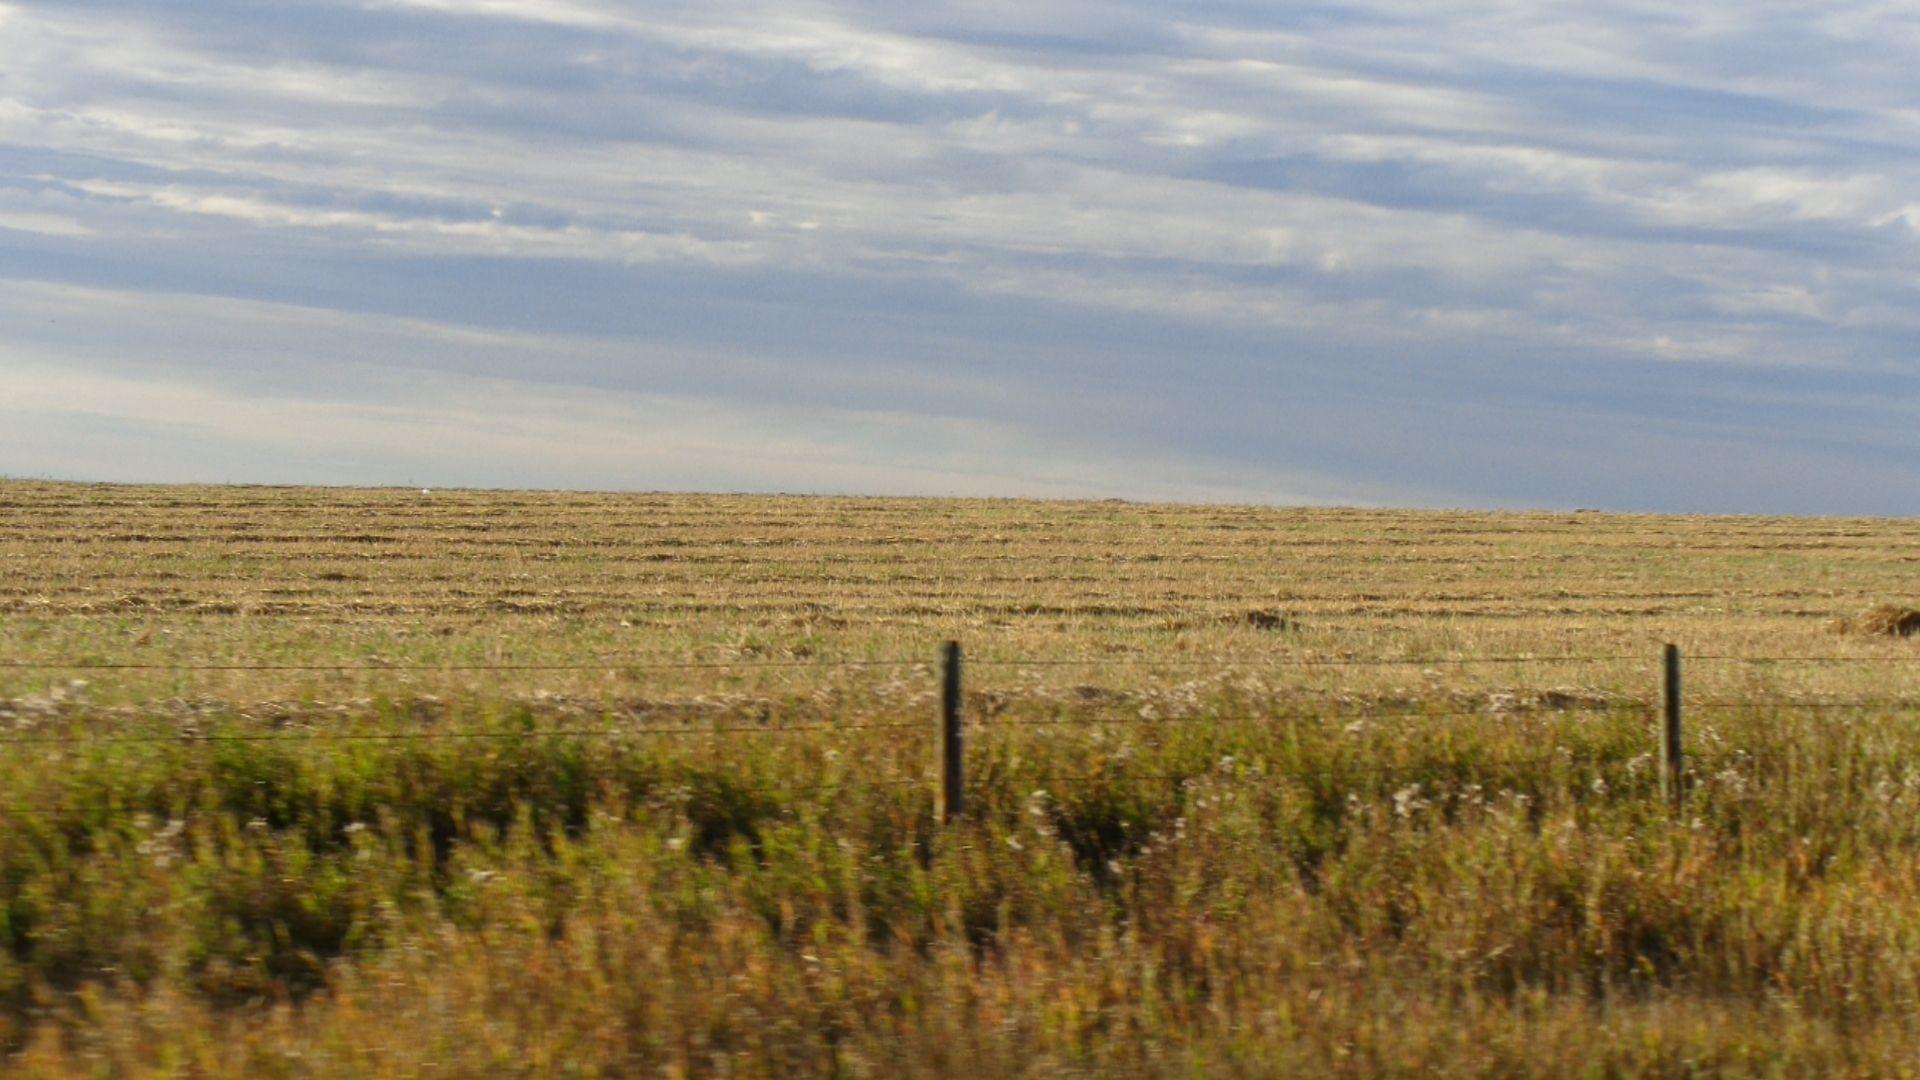 Springbank, Alberta Canadian prairies, Farmland, Outdoor